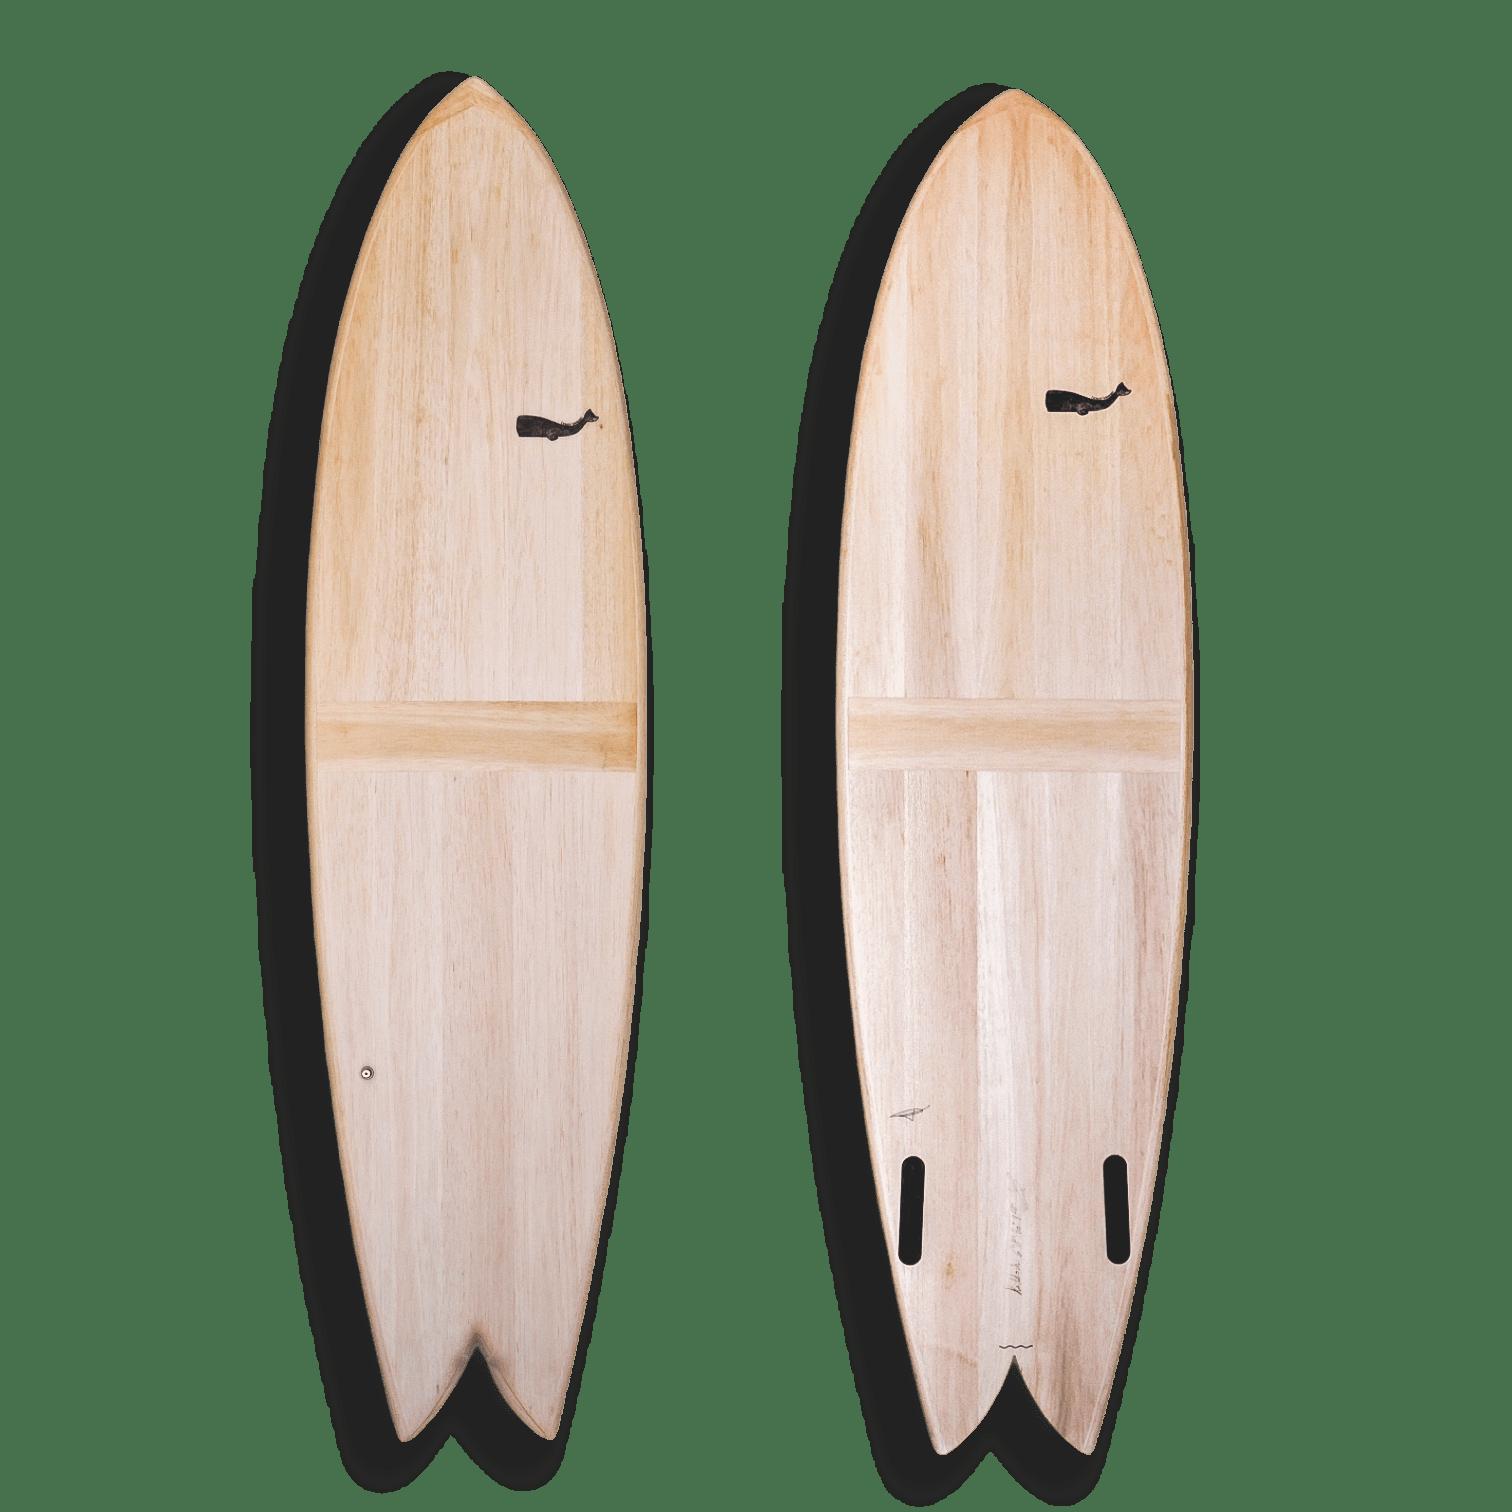 cachalot surfboards planche surf handmade artisan shaper bois hollow quiver haddock